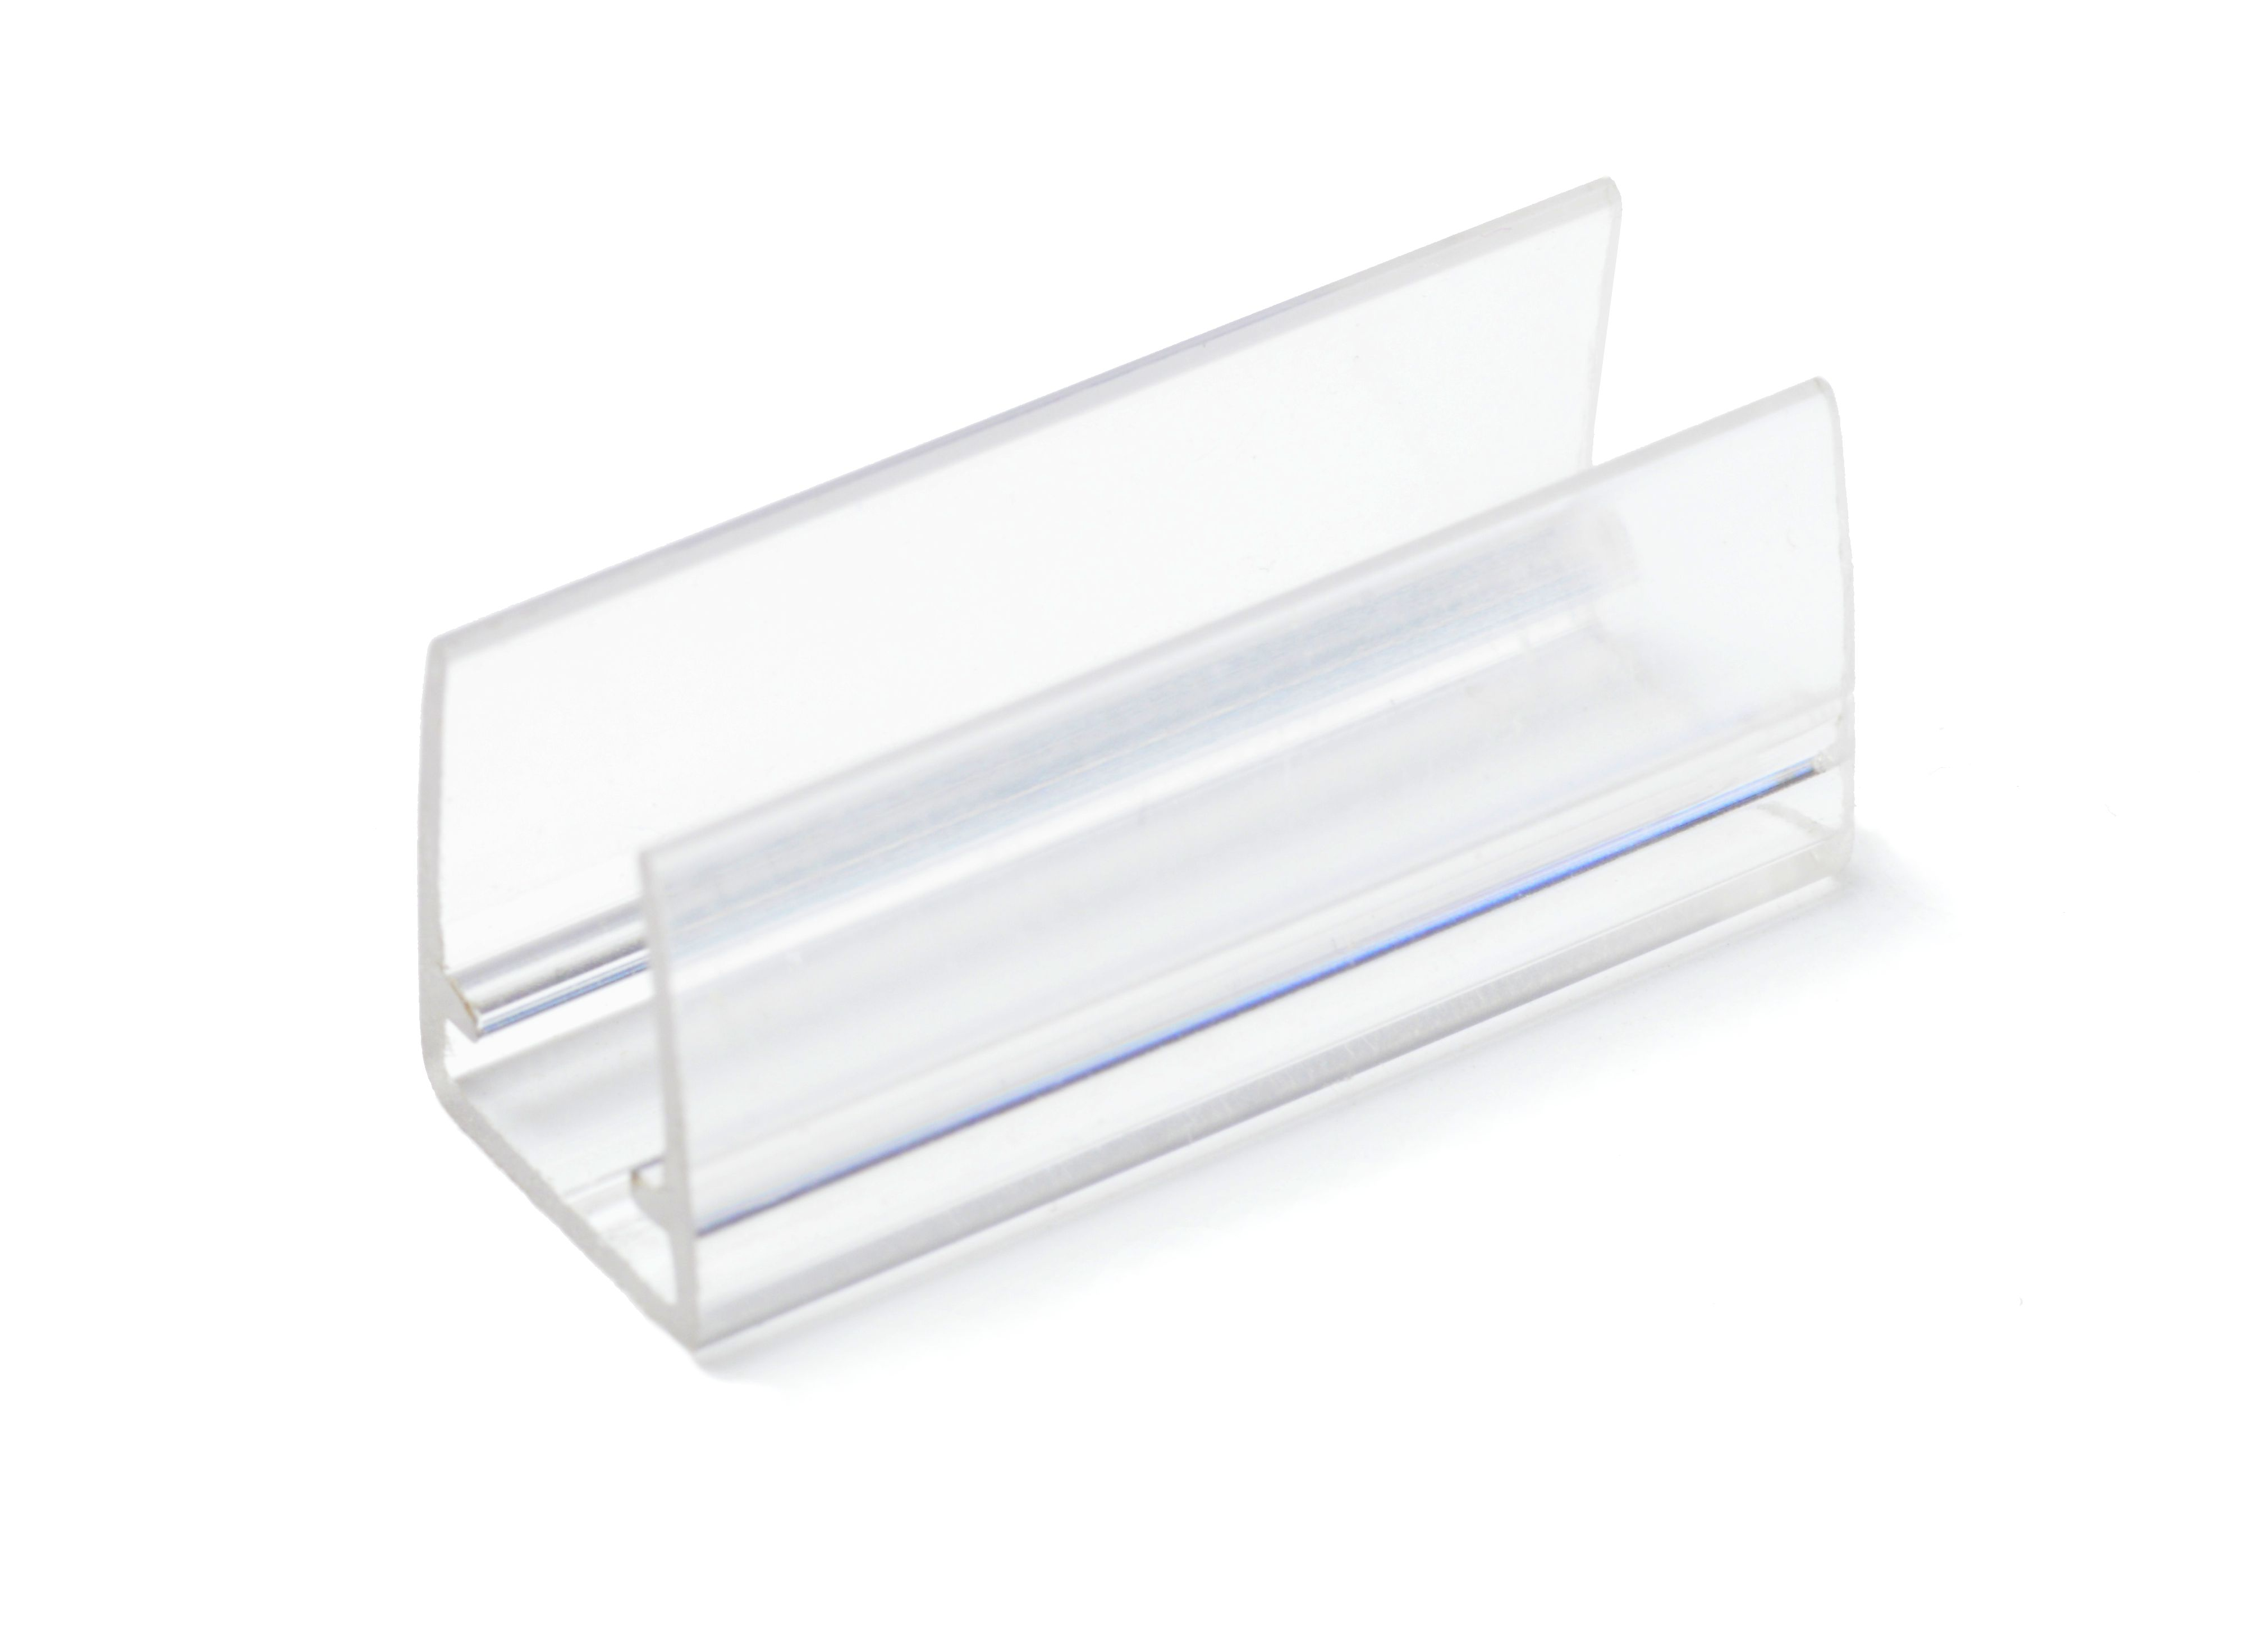 QolorFLEX NuNeon Plastic Mounting Clip, 30mm, Pack of 10